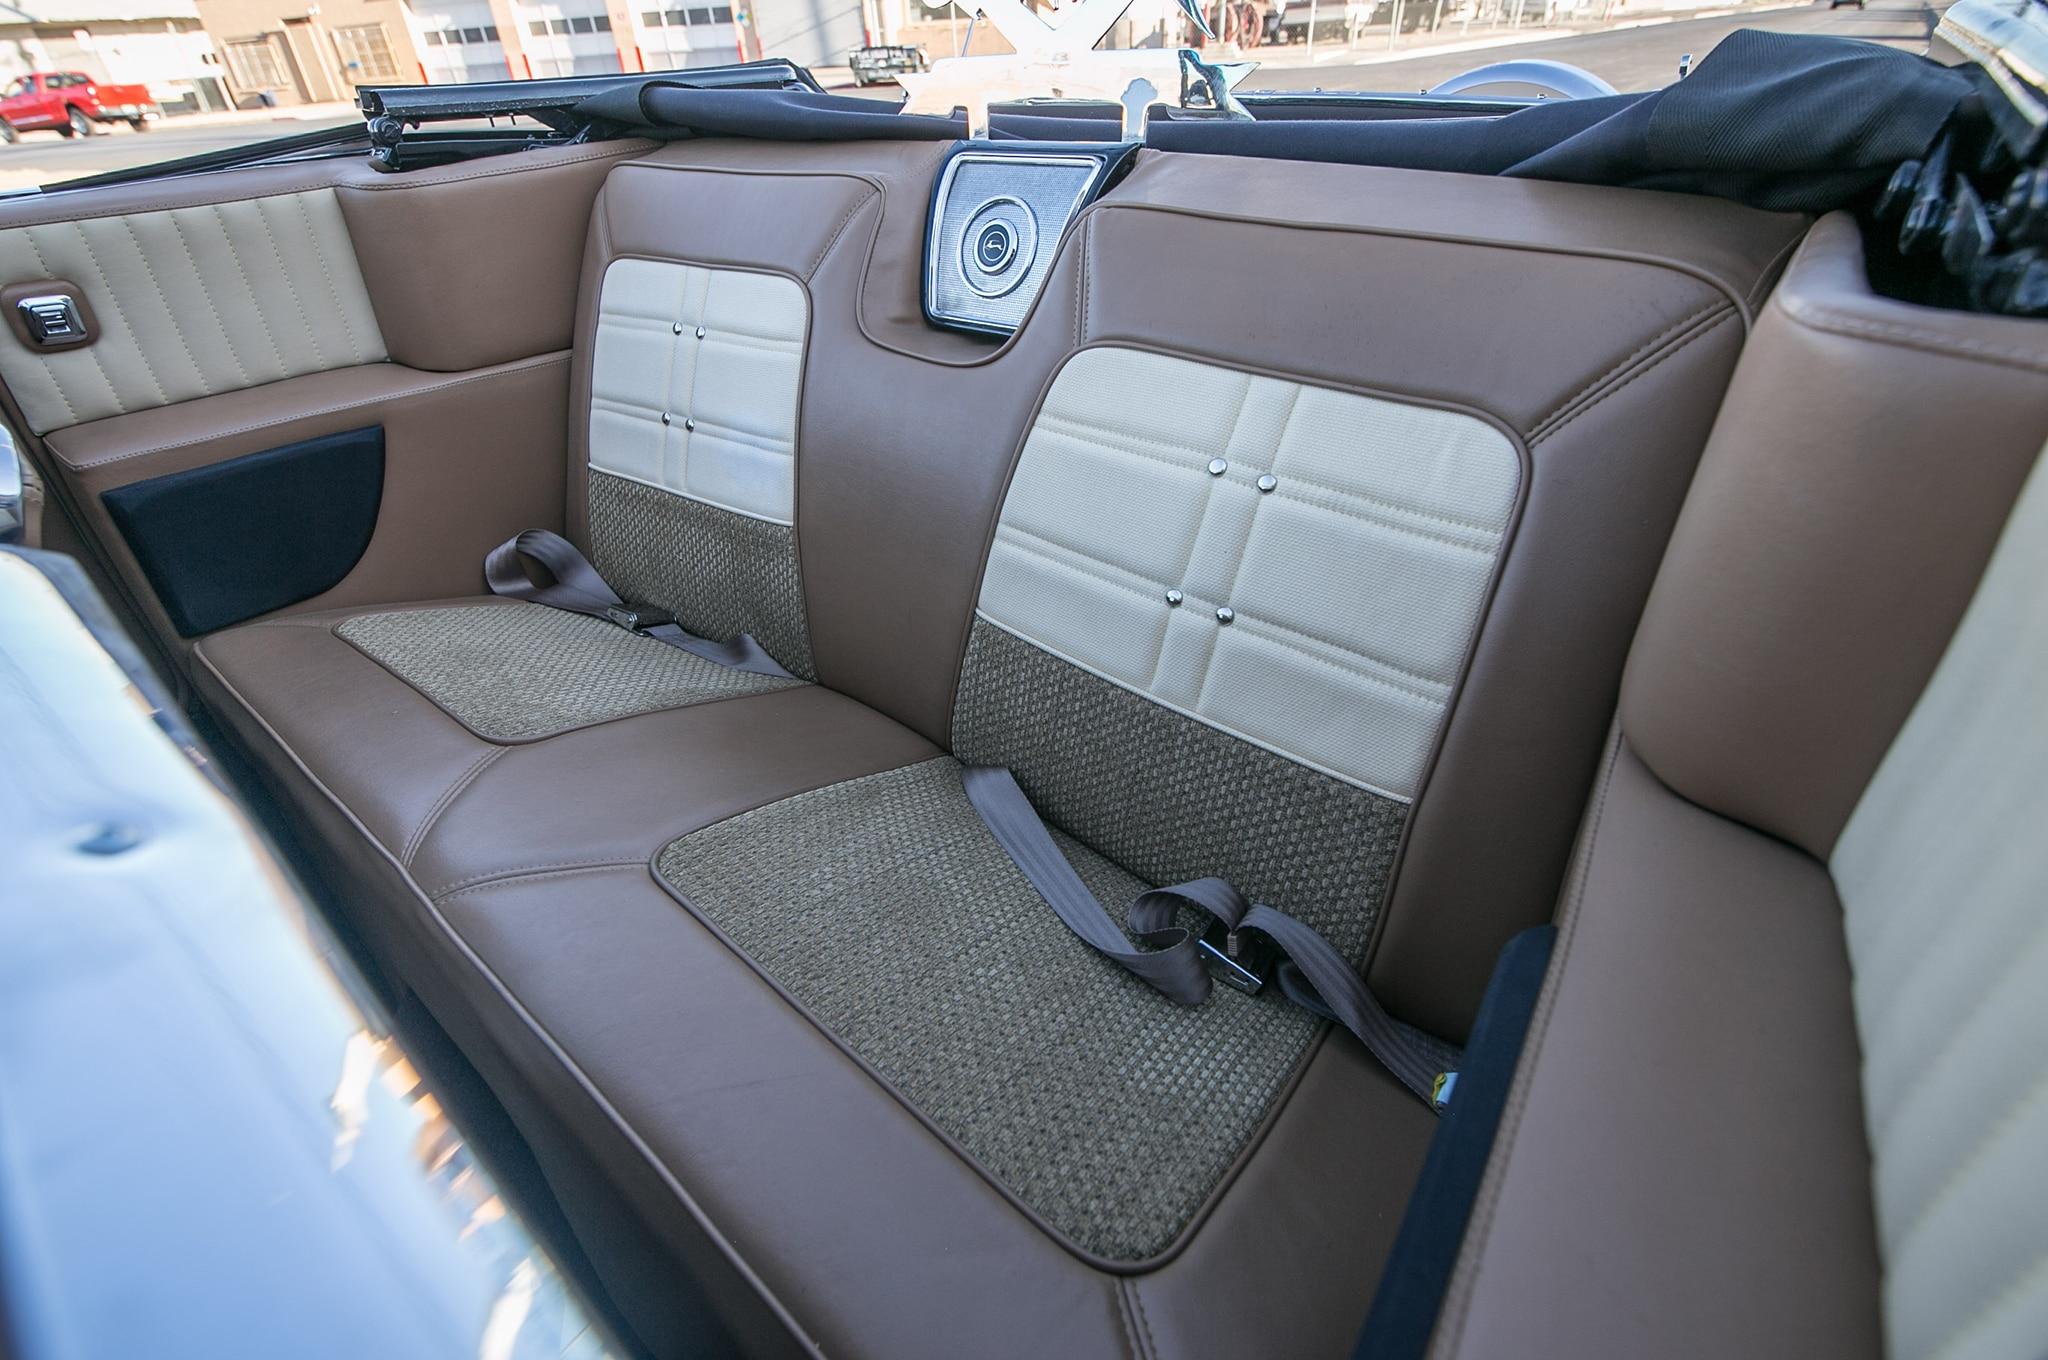 1963 Chevrolet Impala Convertible Interior Back Bench Seat